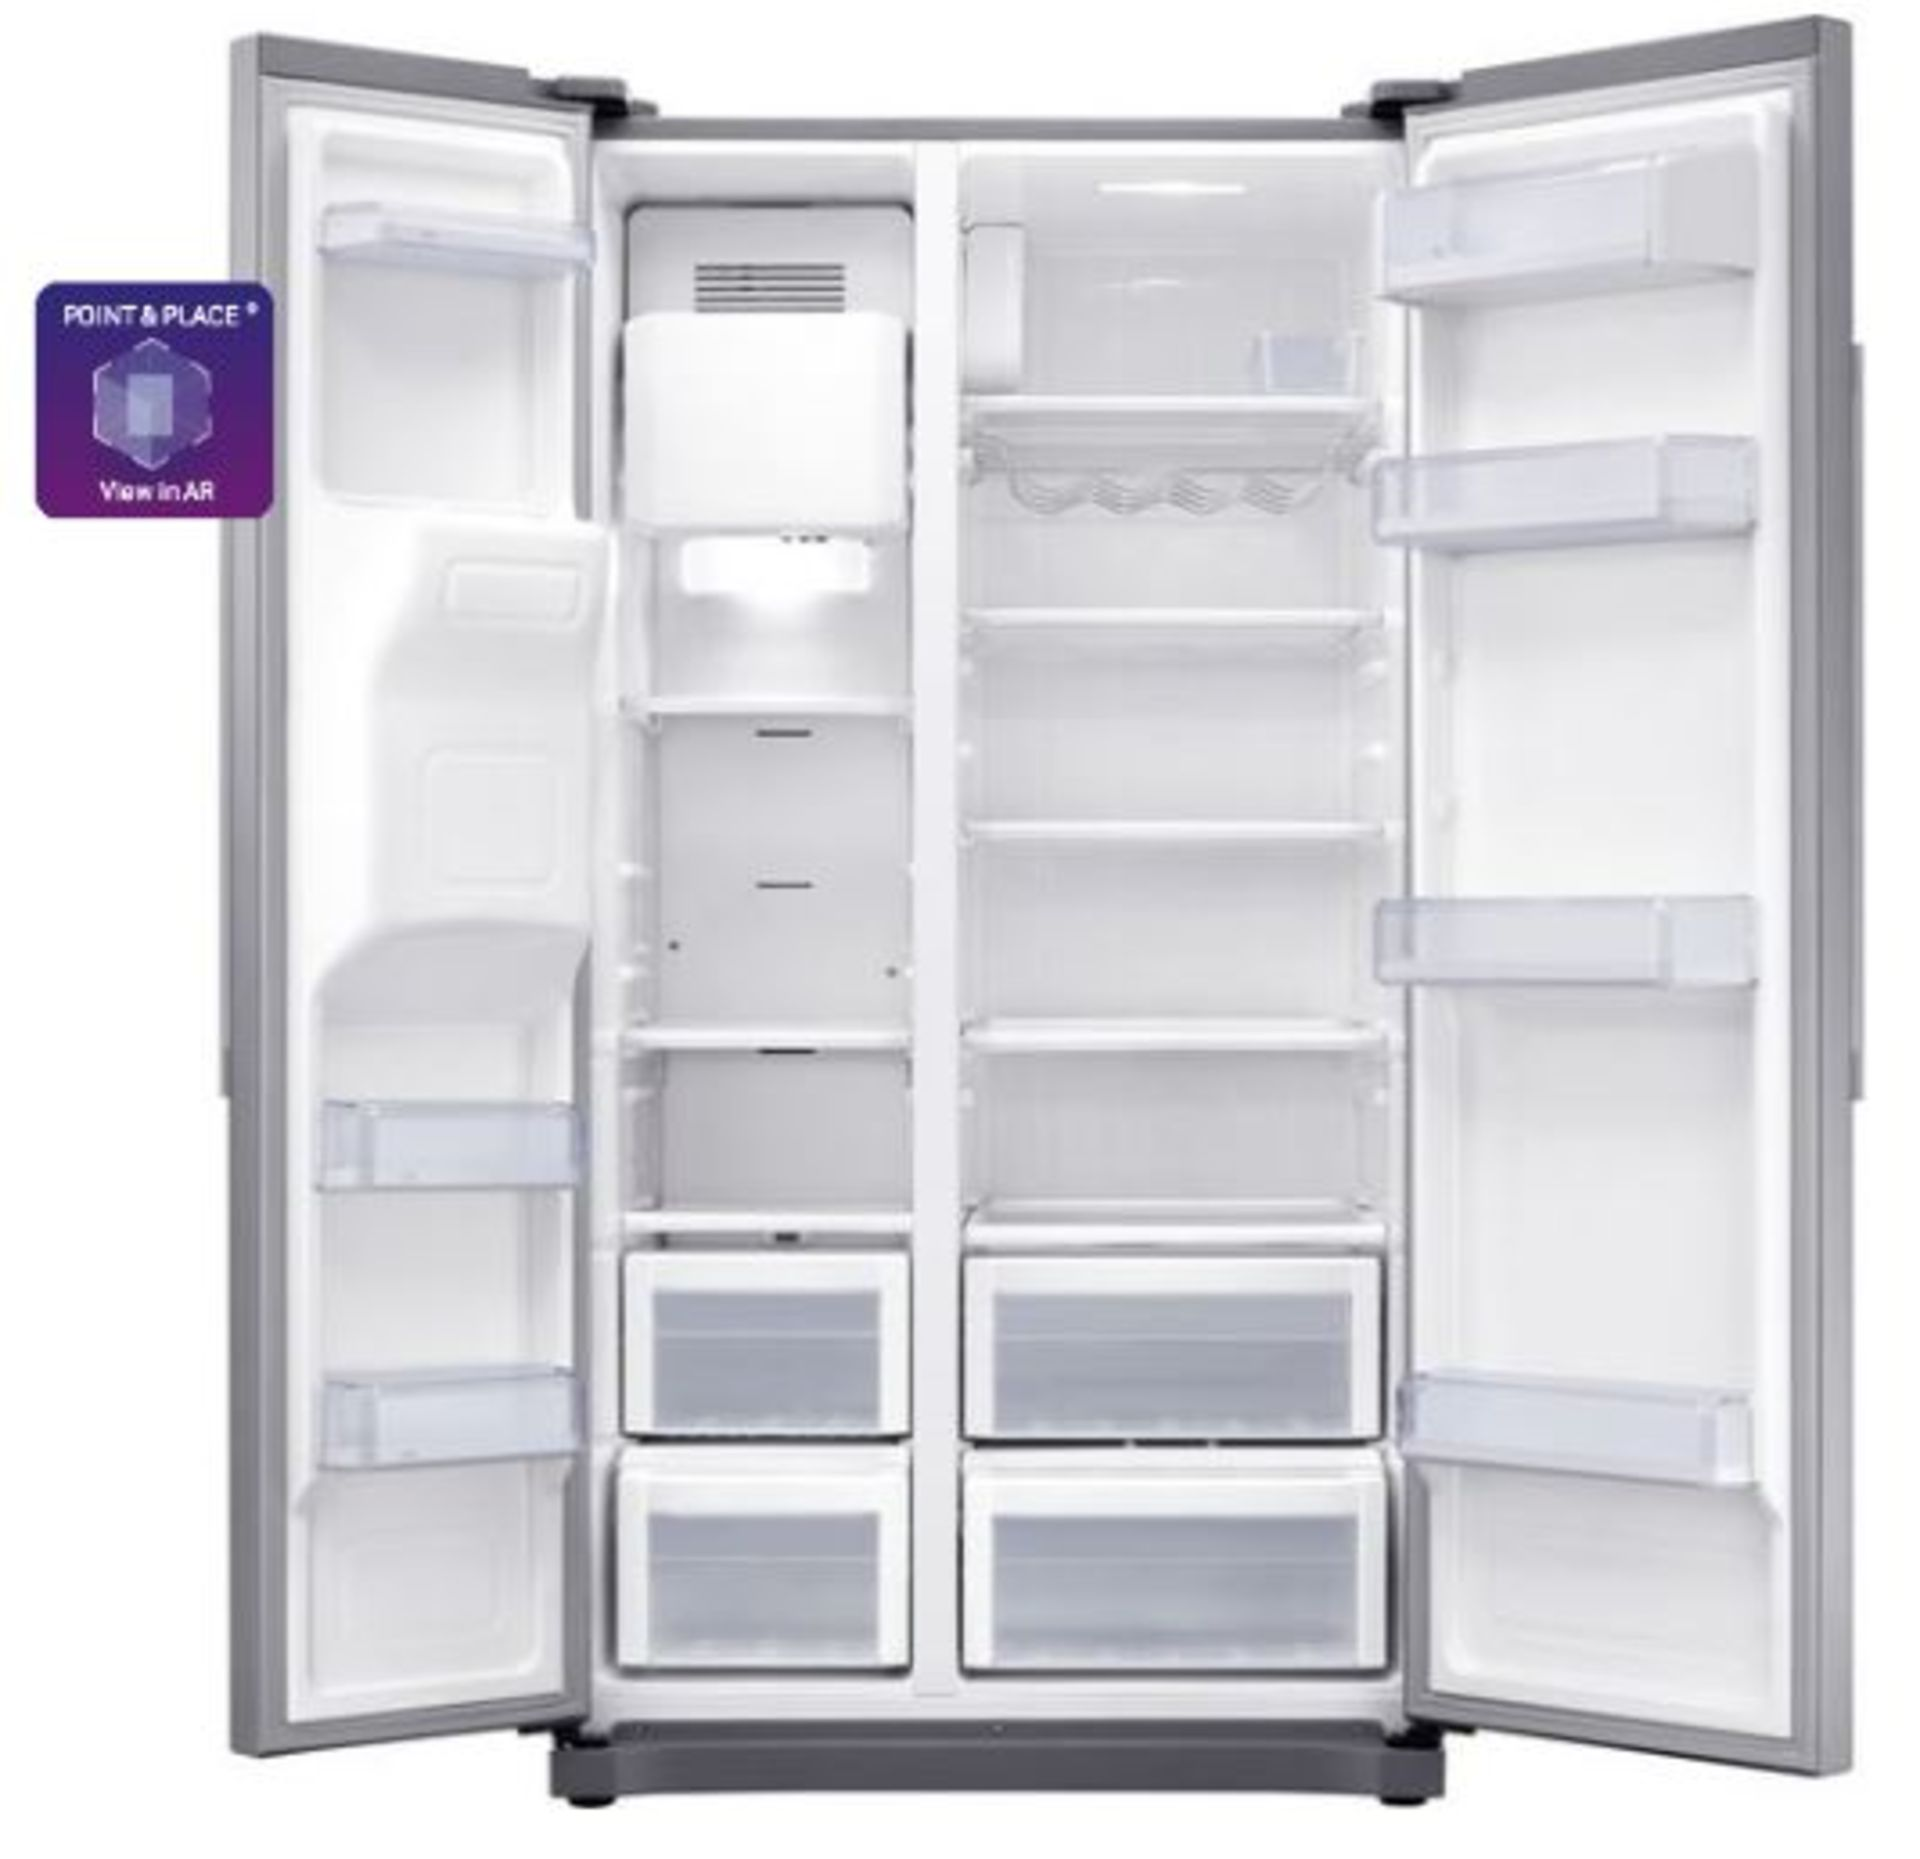 Pallet of 1 Samsung Water & Ice Fridge freezer. Latest selling price £929.99* - Image 3 of 9